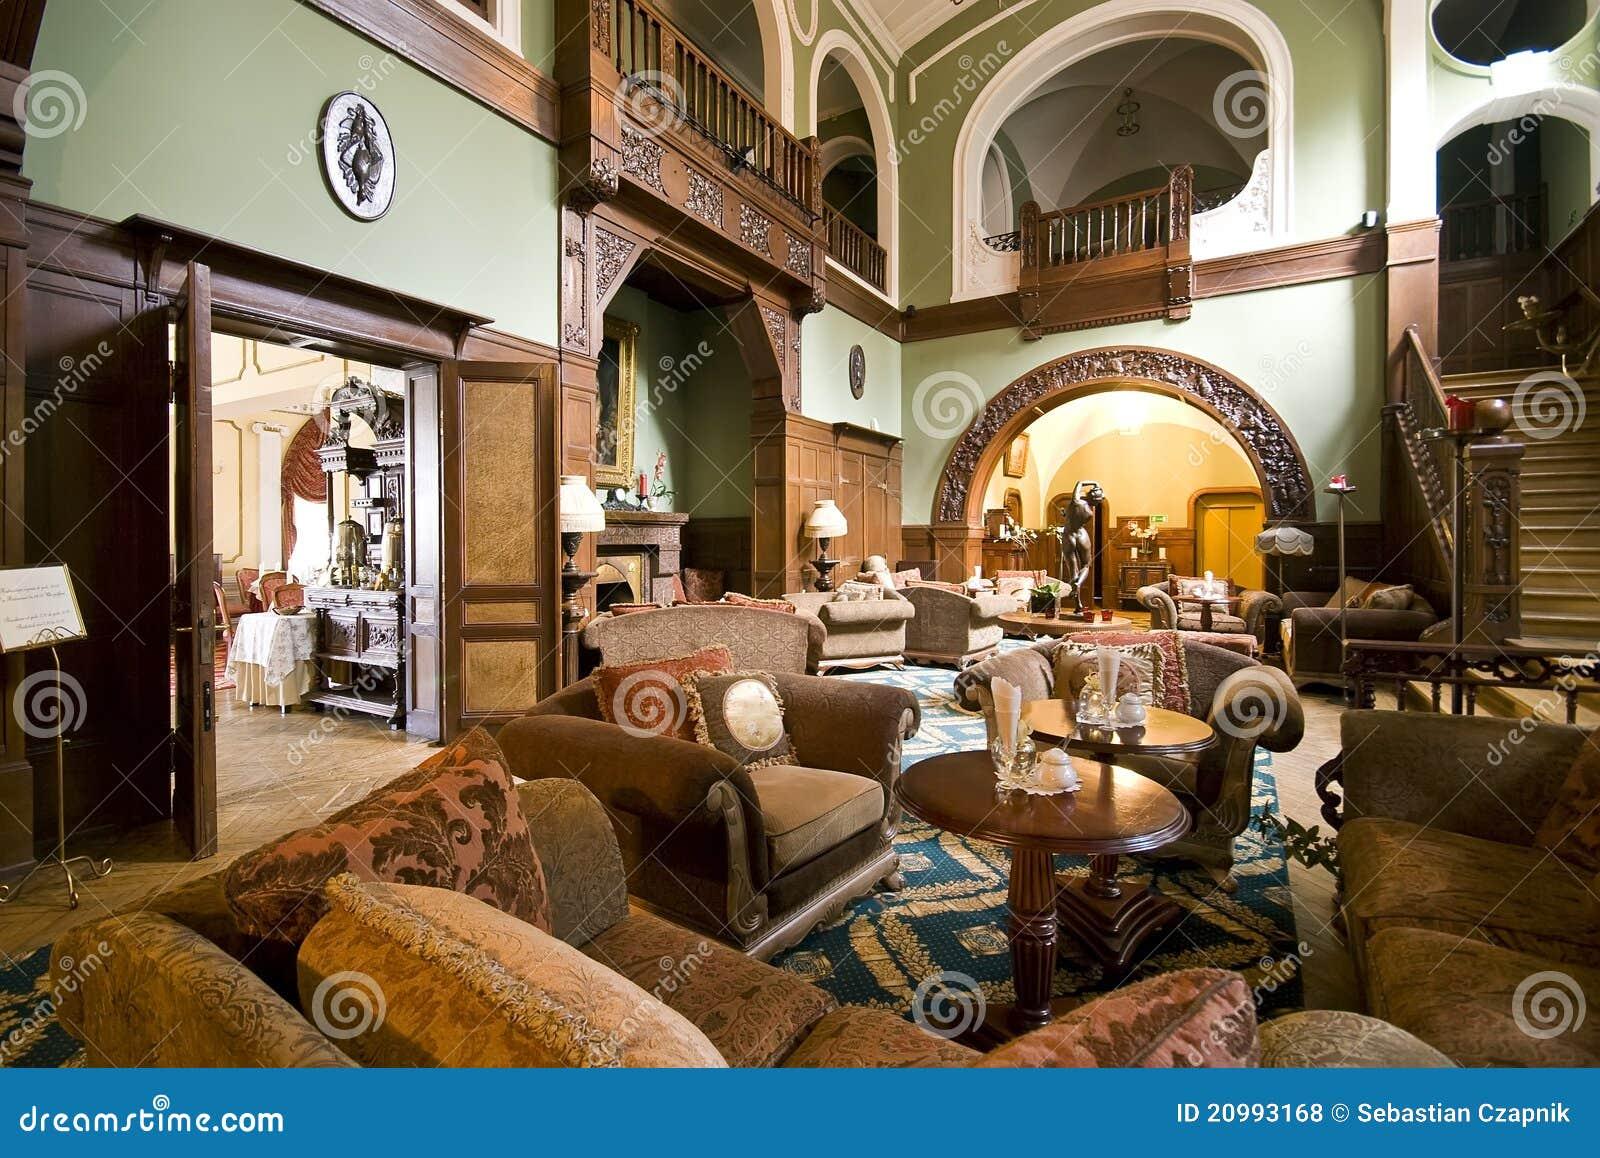 classic hotel lobby royalty free stock photos   image